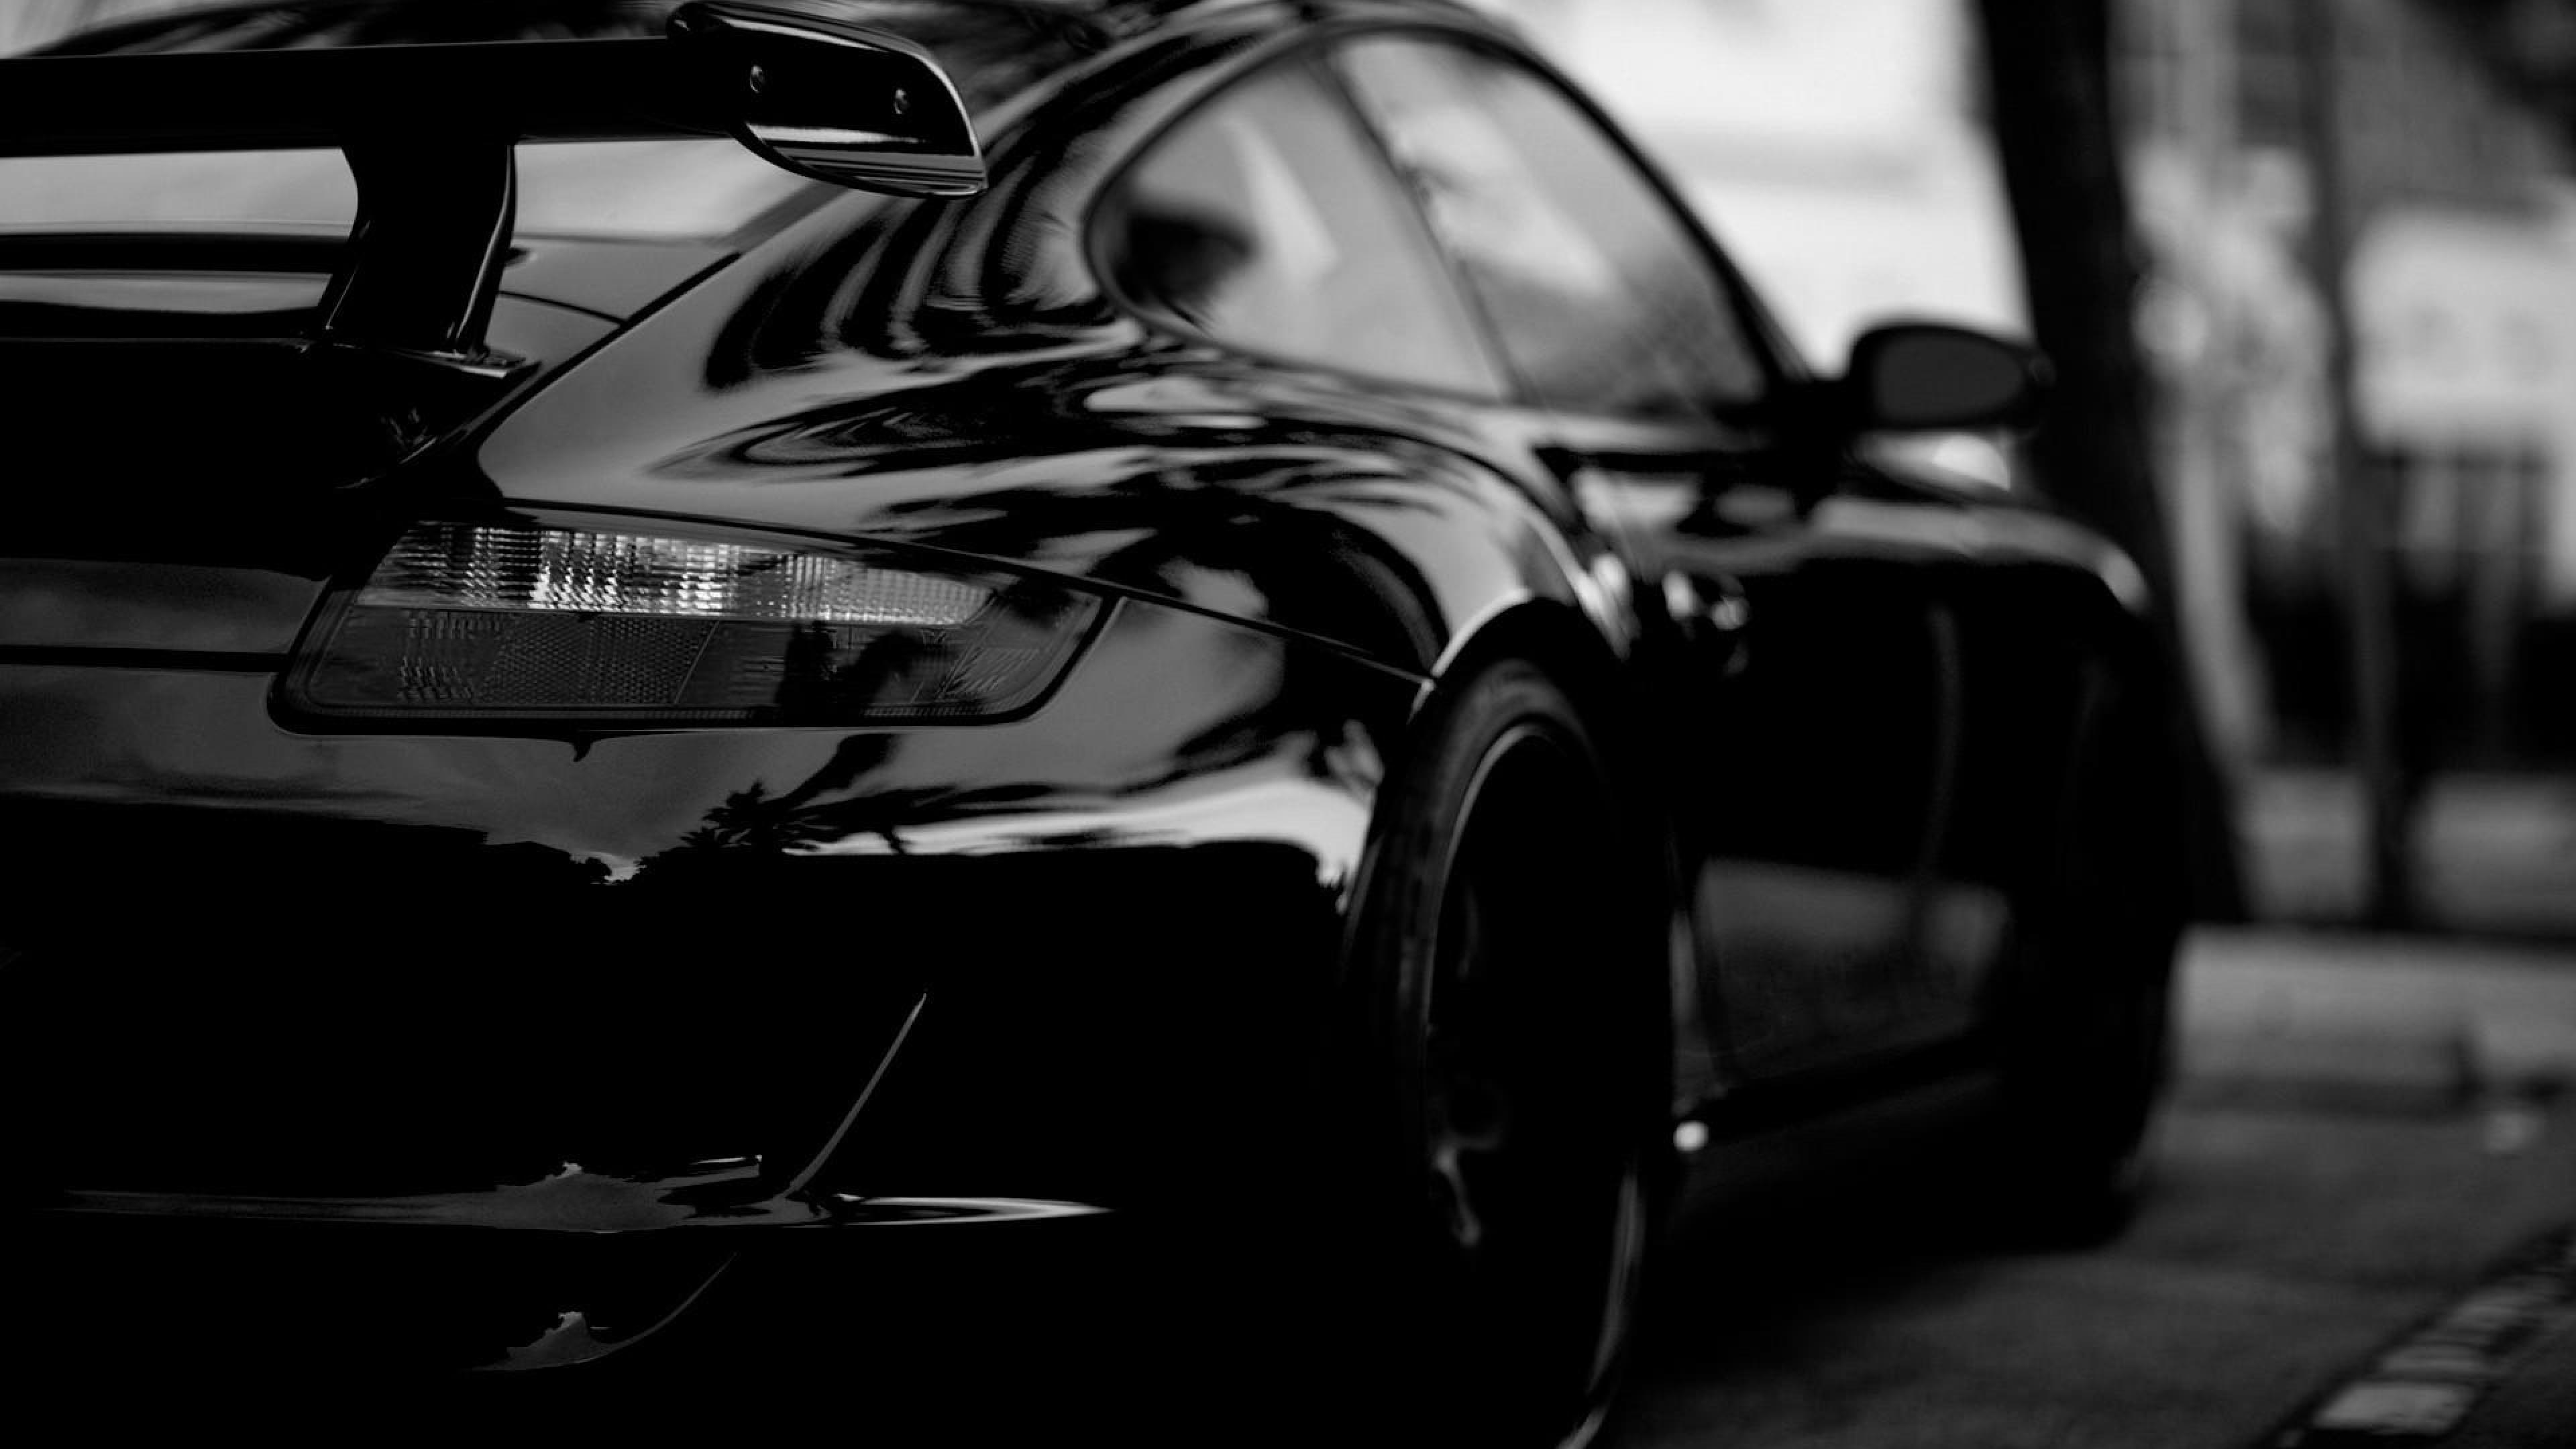 Seattle Porsche Repair Seattle Porsche Service,Seattle Porsche Tuning Seattle Porsche Mods